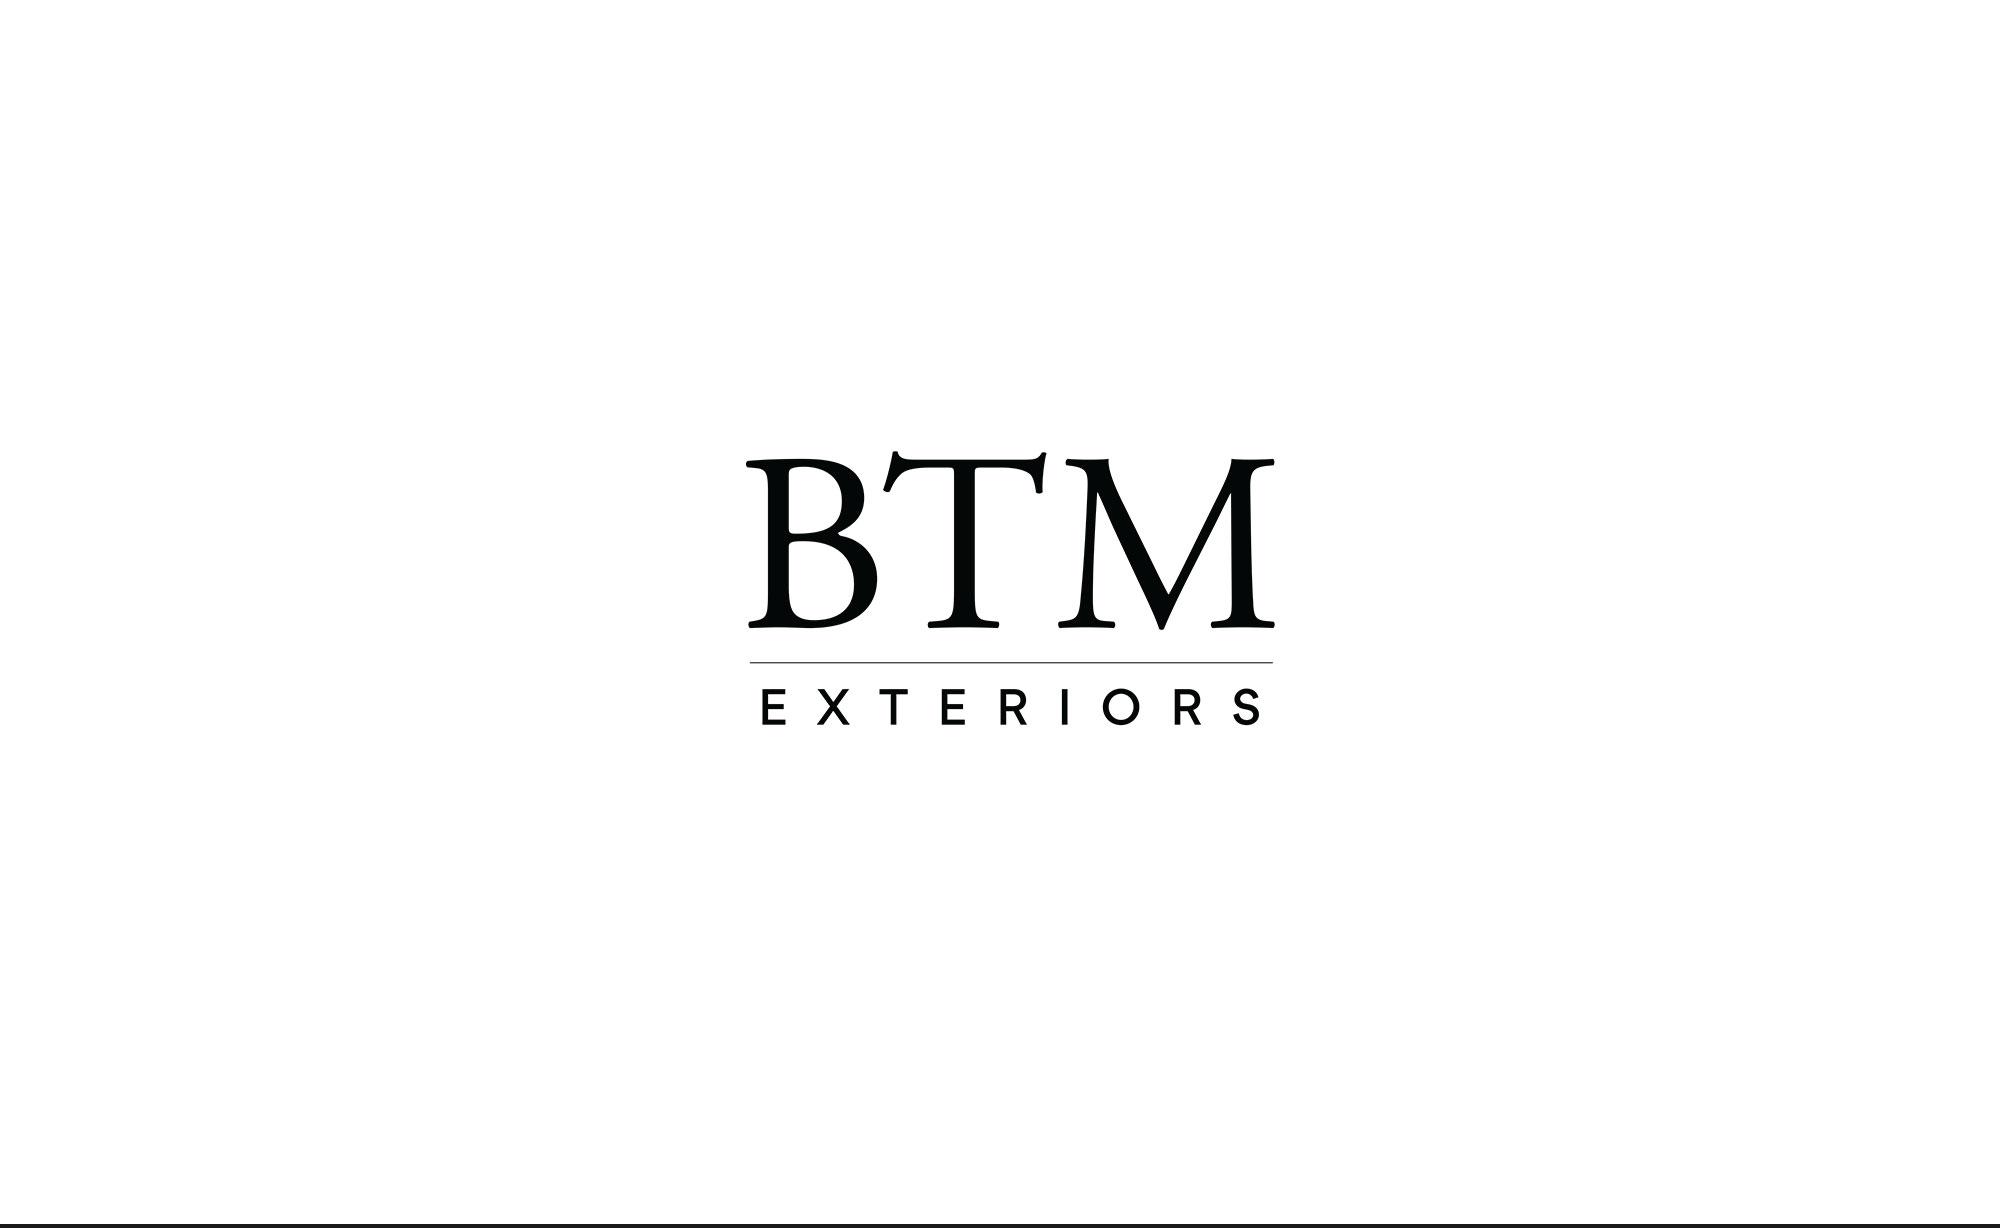 ©-Chris-Rae-Design-BTM-Exteriors-Brand-Logo-Identity-Design-01.jpg